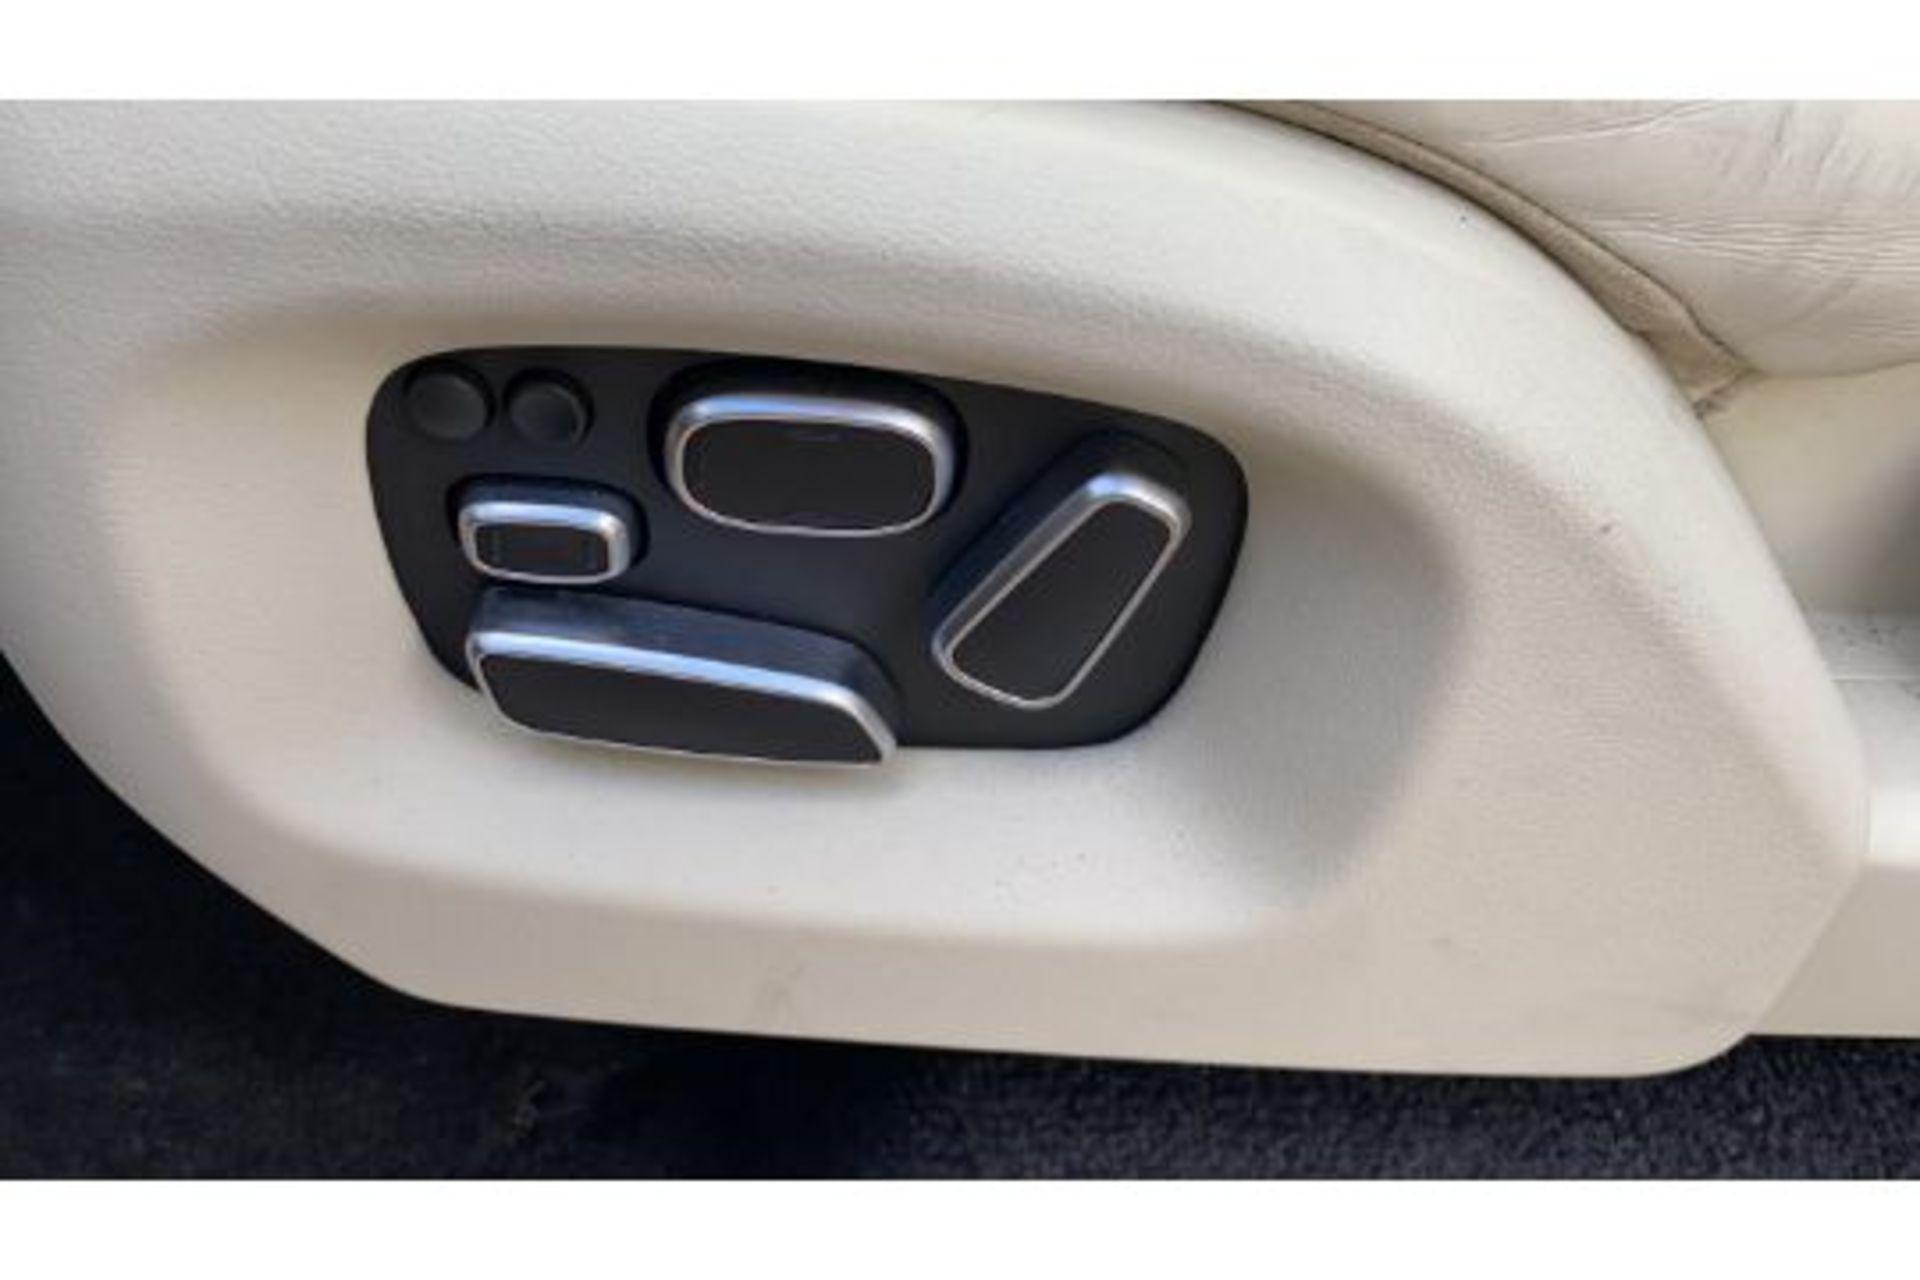 Range Rover Vogue 3.0 TDV6 SE Auto - Black Pack - NEW SHAPE - FULLY LOADED - Pan Roof - Image 28 of 30